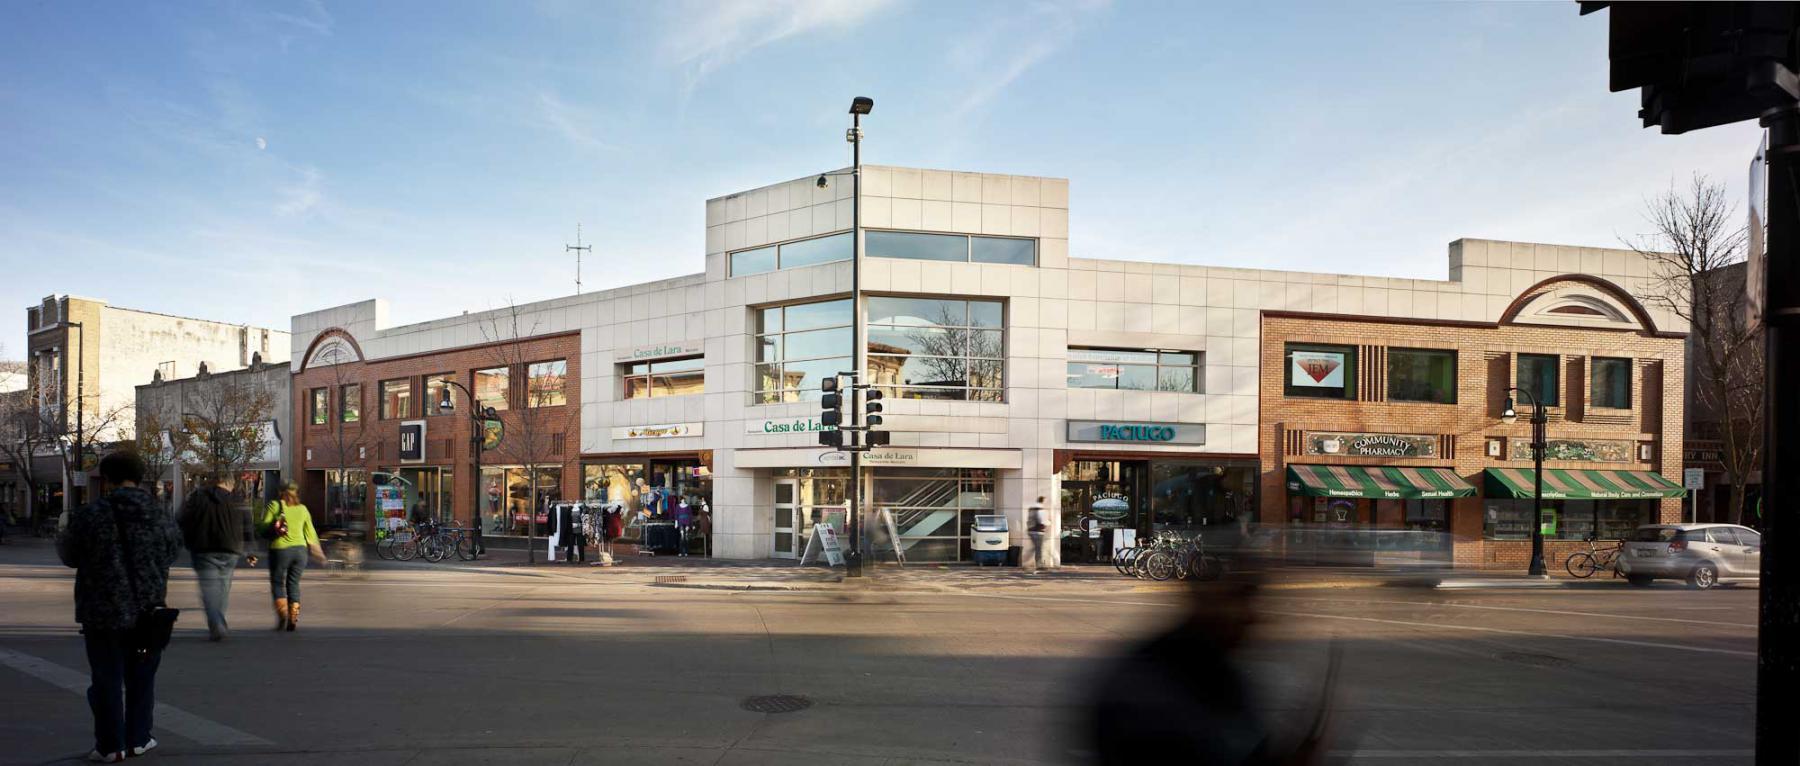 ULI 341 State Street Retail Property